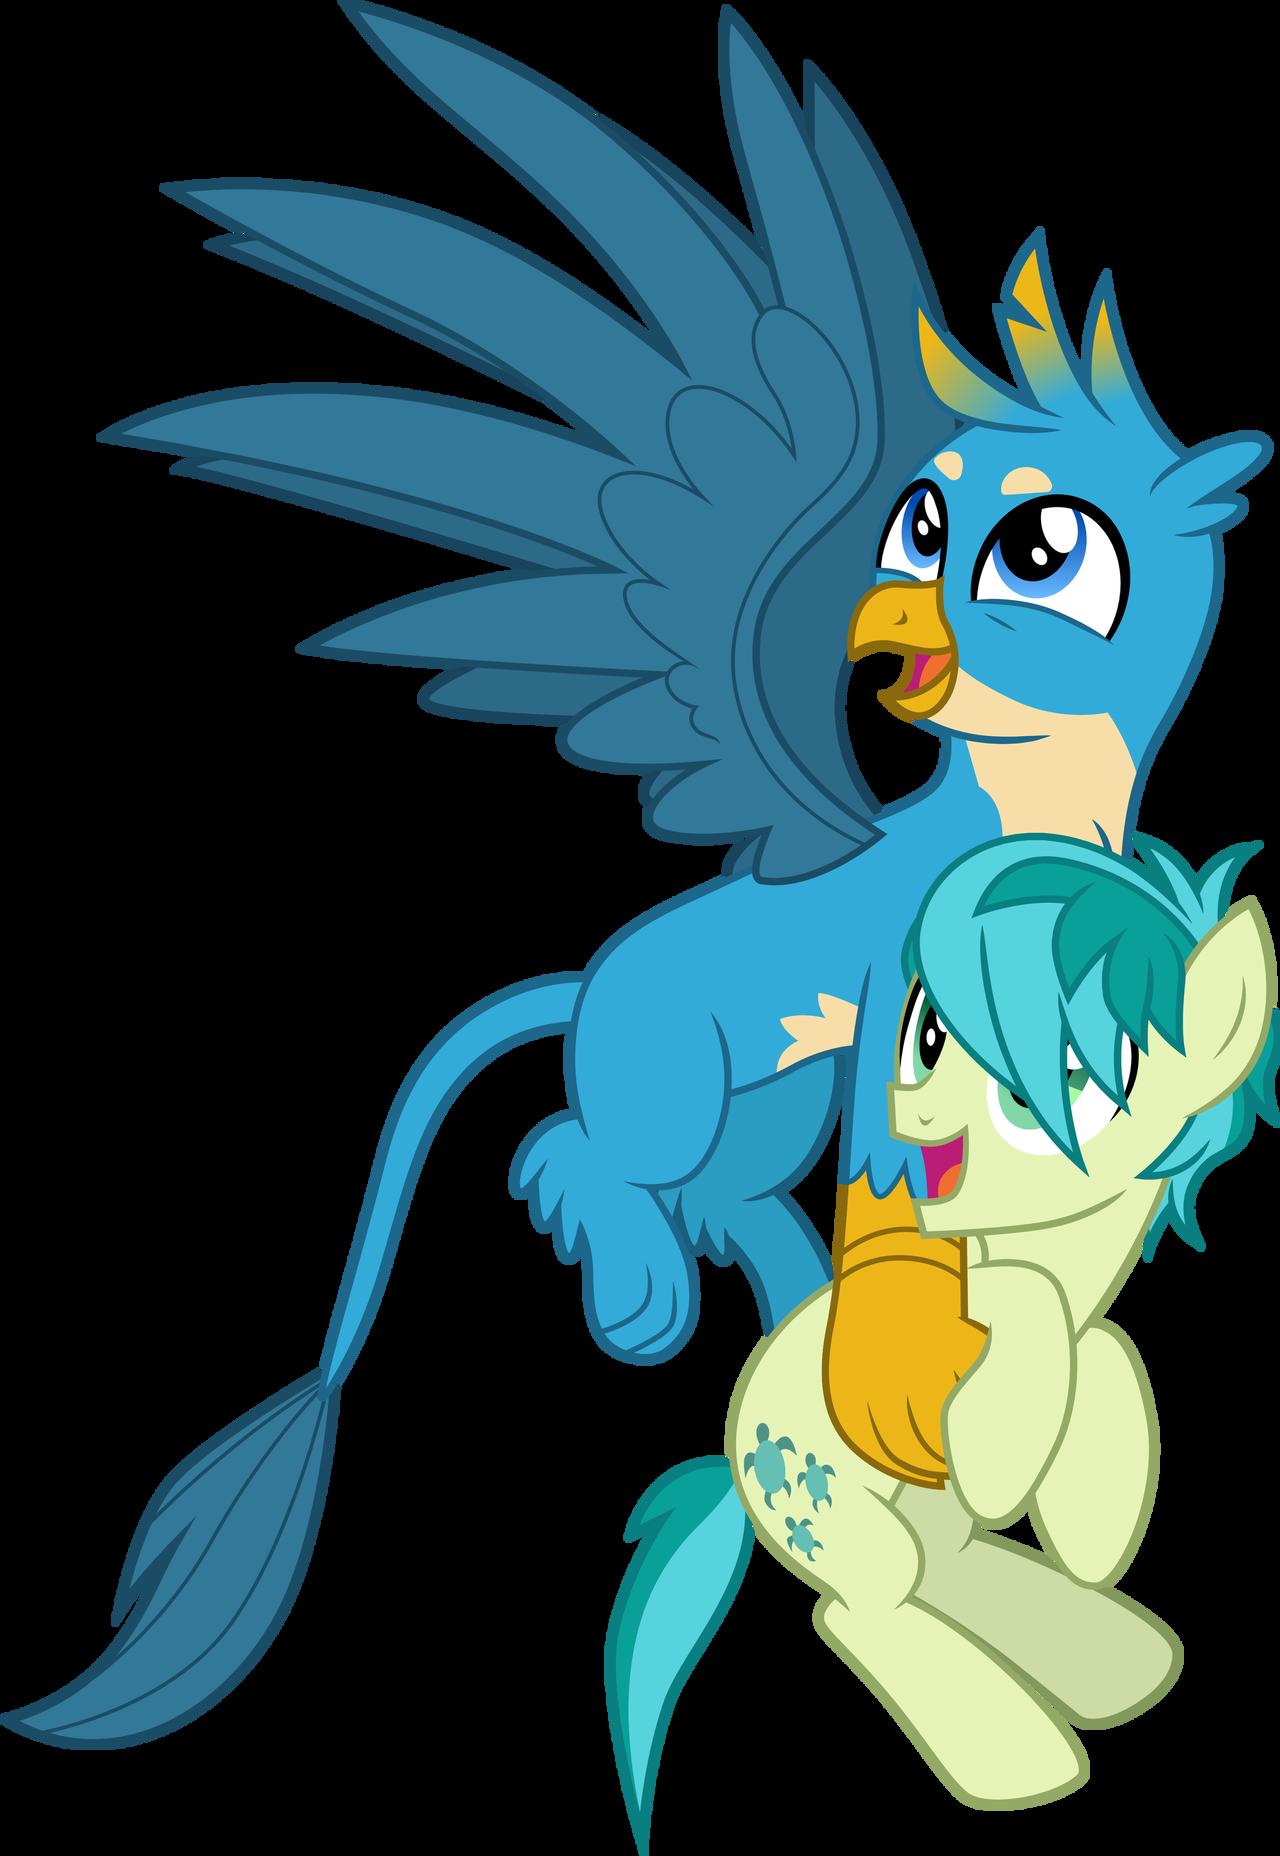 Flying! My little pony cartoon, Little pony, Pony